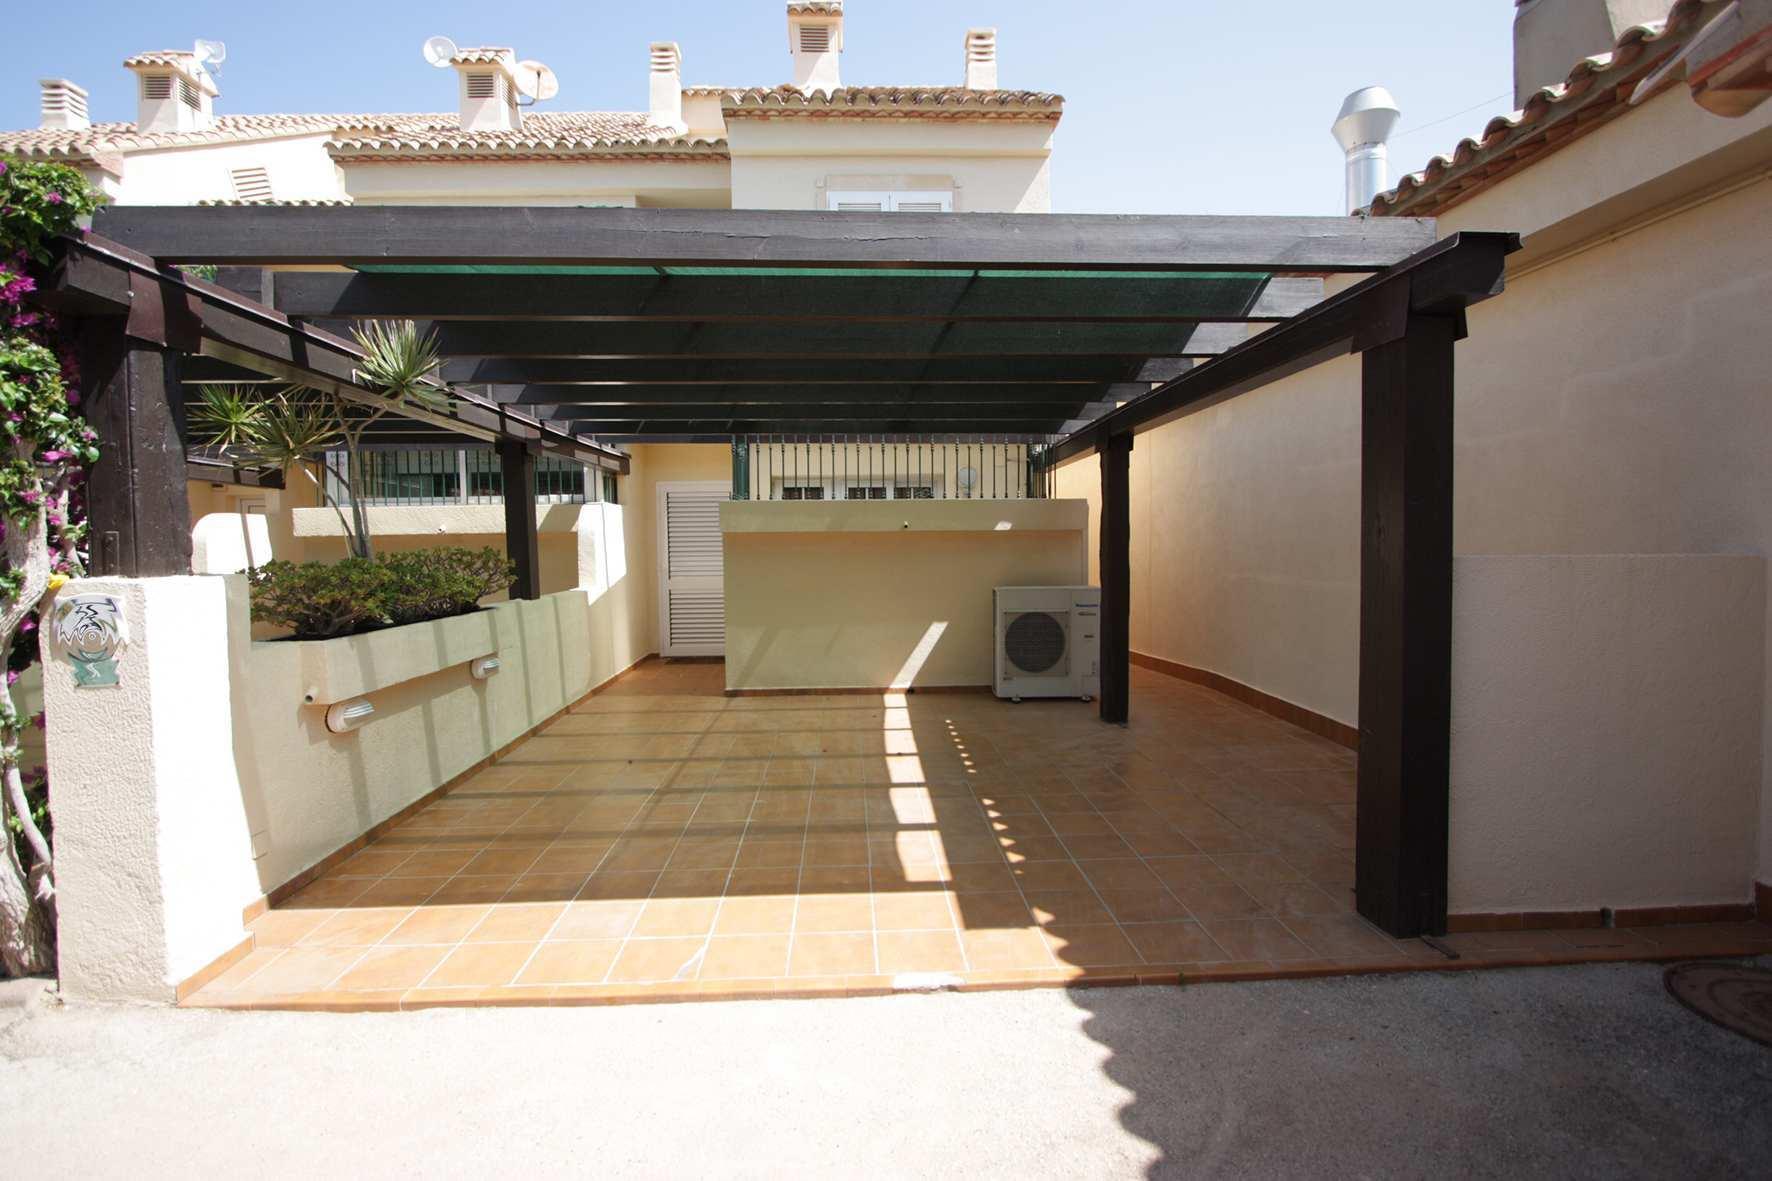 Townhouse in Denia Marinas